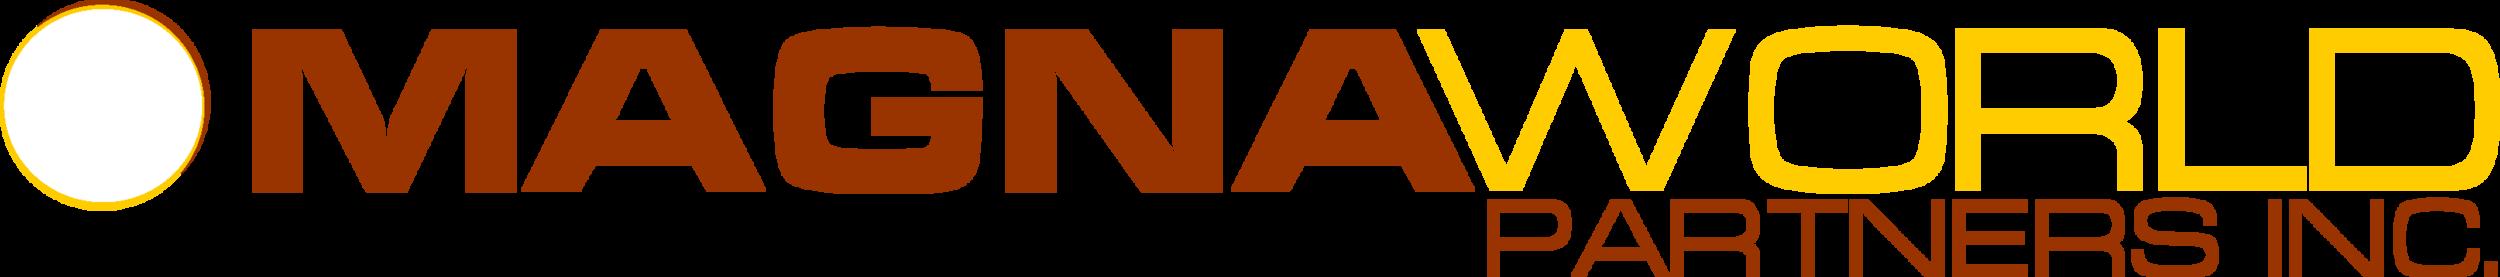 logo_samad.png